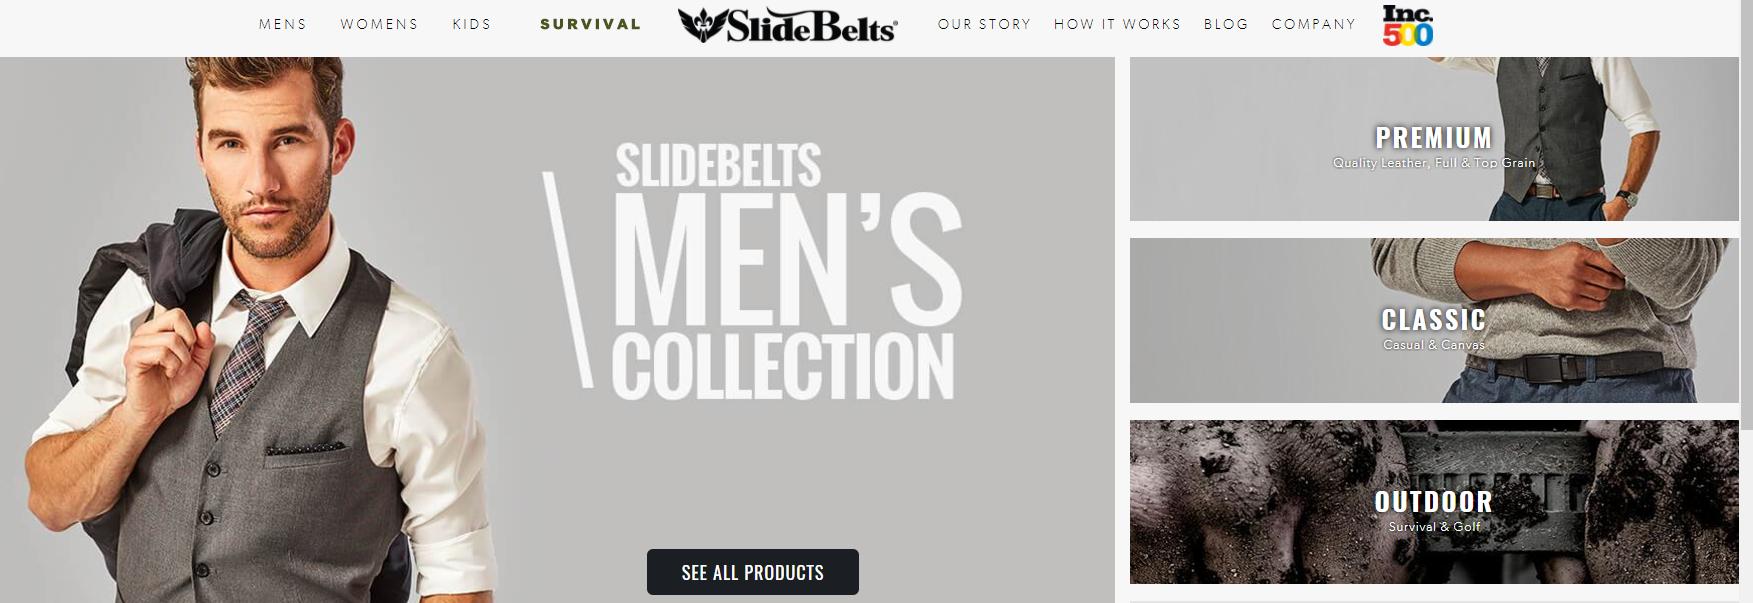 slide belts online store